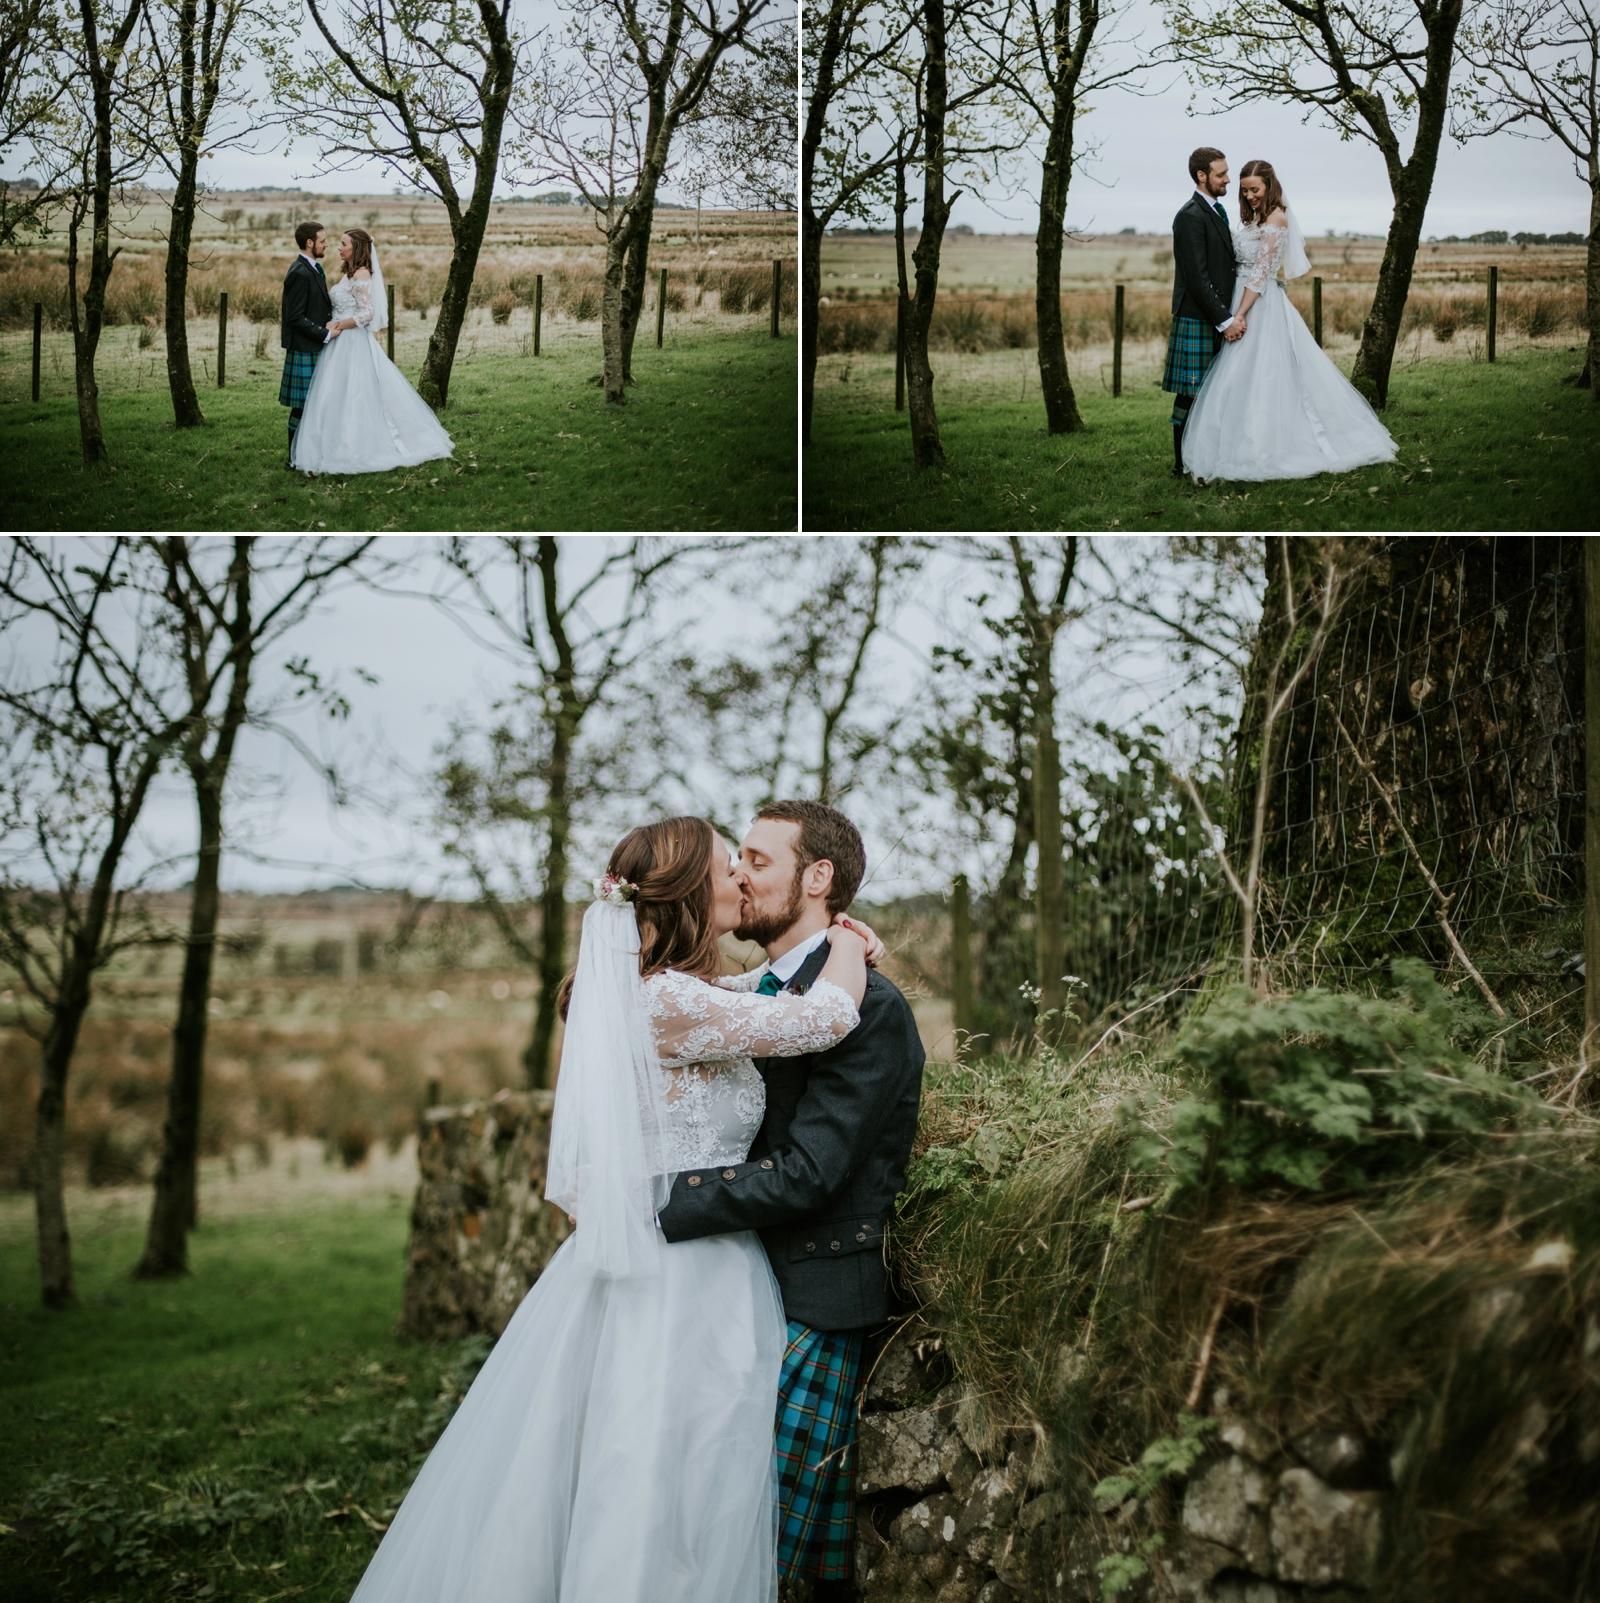 HarelawFarm_Ayrshire_Nuala&Colin_IntheNameofLovePhotography_0126.jpg